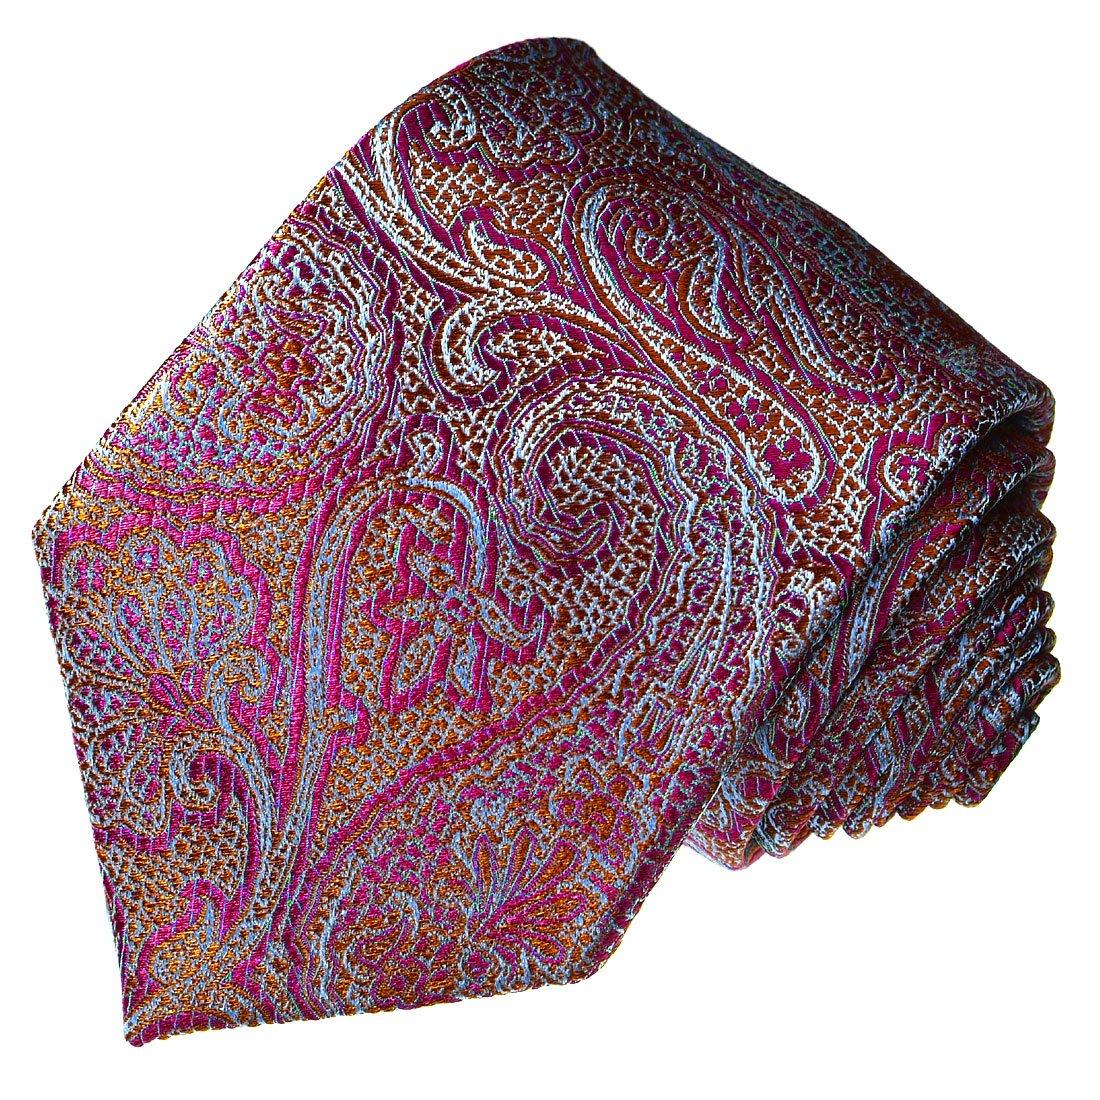 LORENZO CANA Luxury Italian 100/% Silk Tie Jacquard Woven Paisley Red 12028